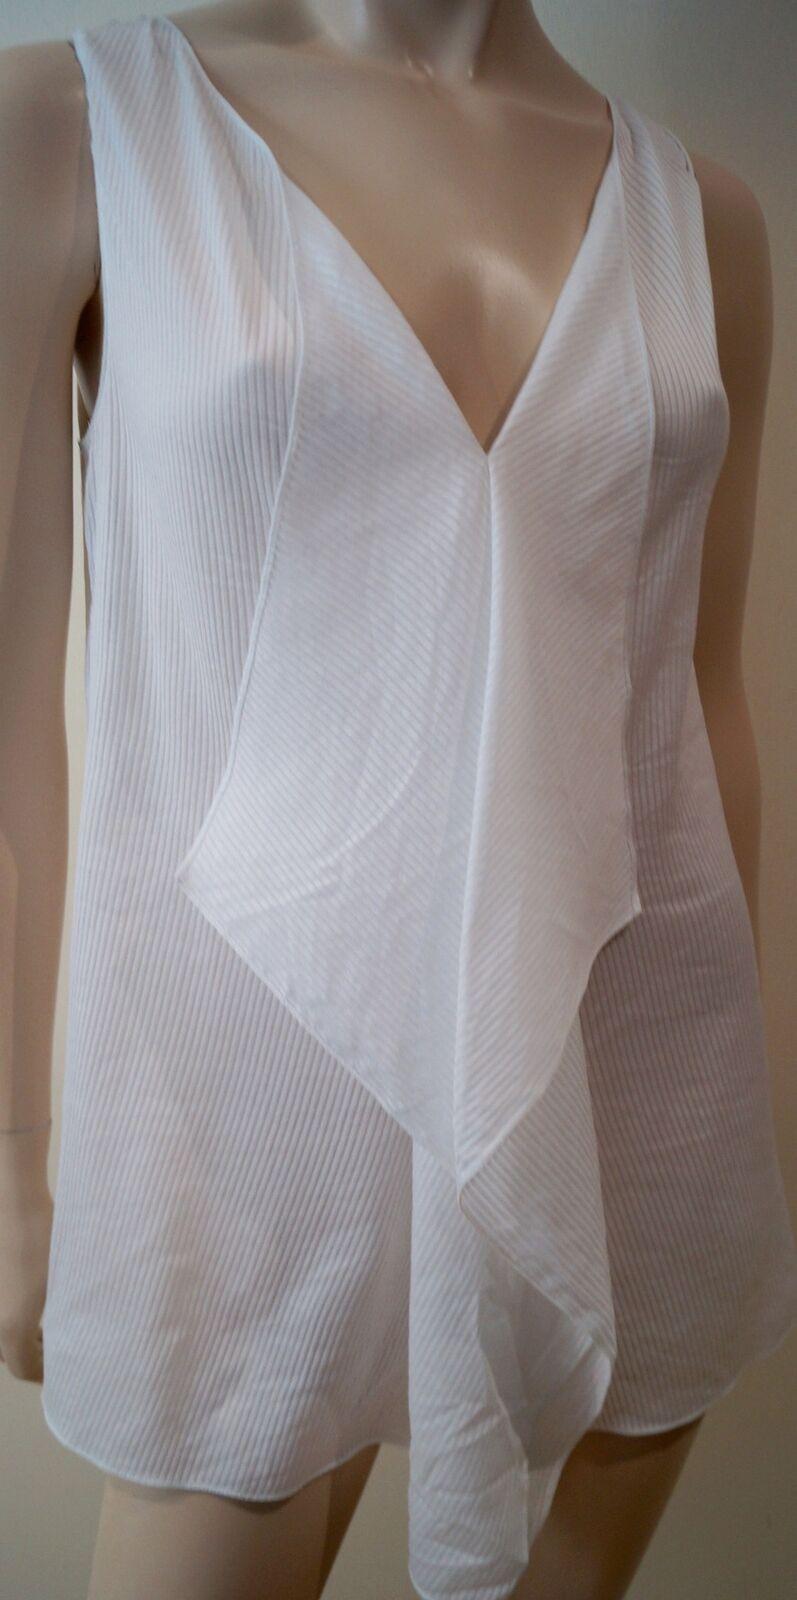 STELLA MCCARTNEY White Cotton Silk Stripe Embossed Sleeveless Blouse Top 40 UK10